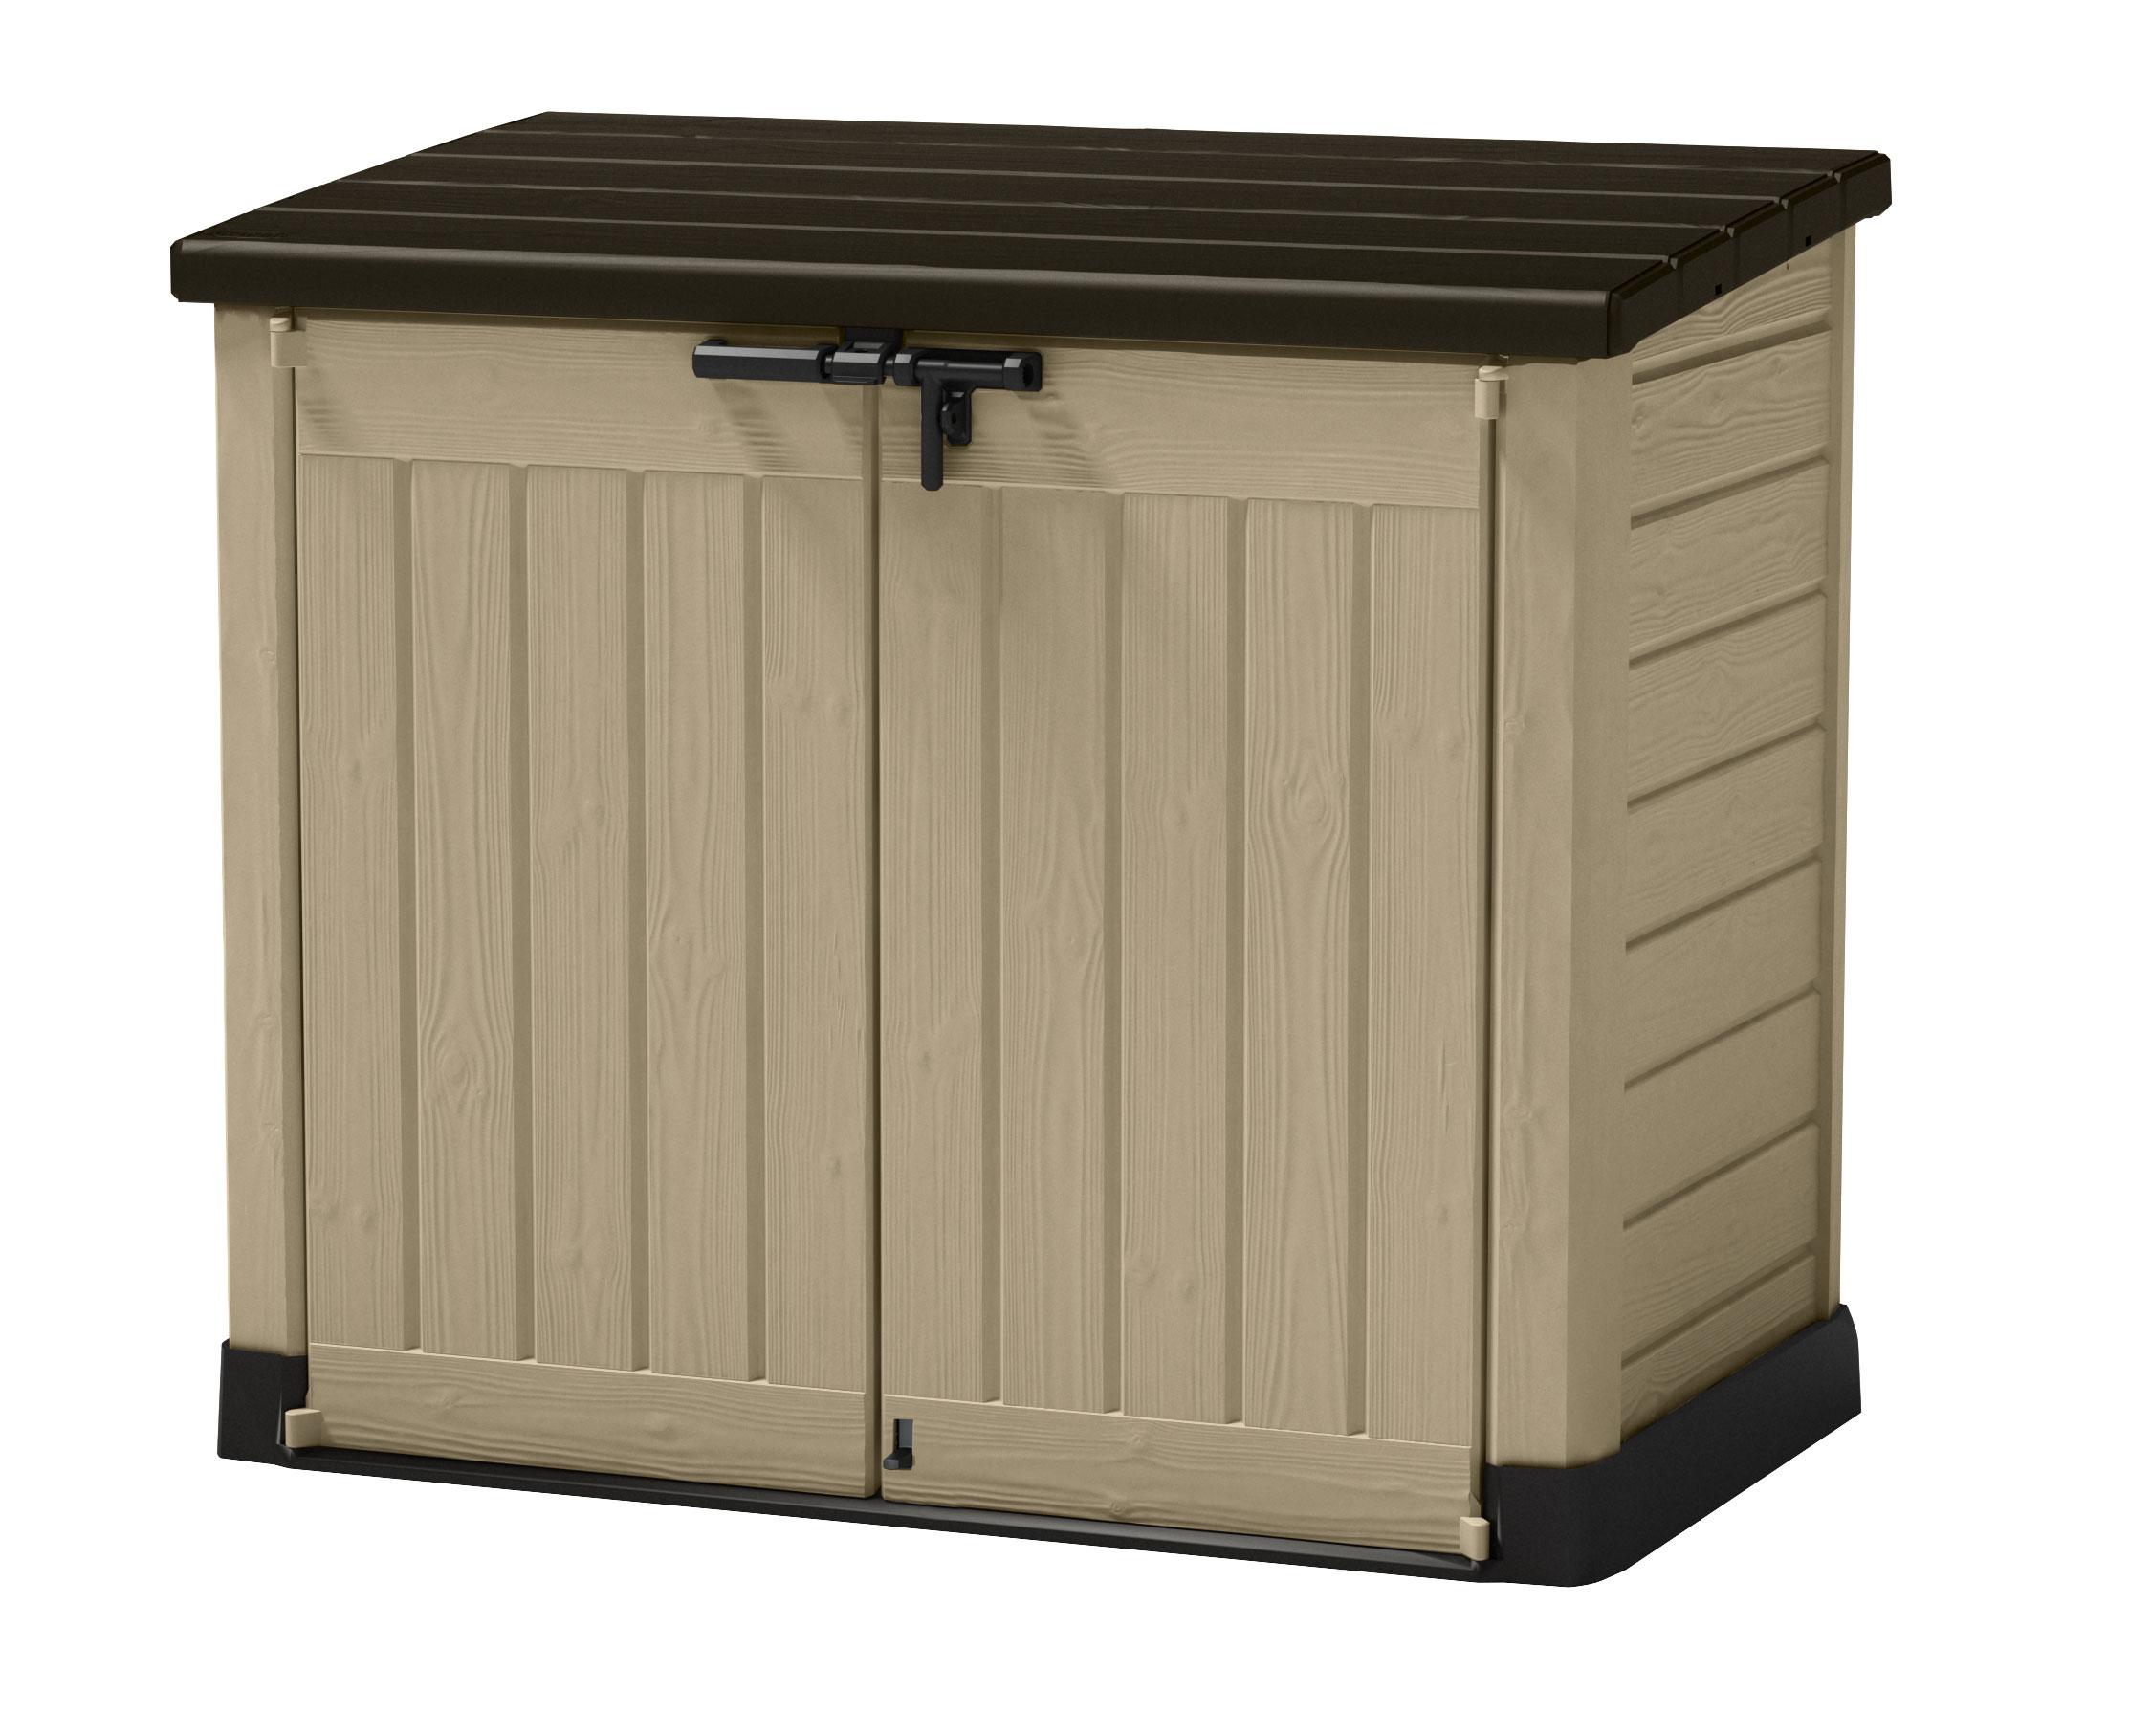 gartenbox aufbewahrungsbox store it out max tepro 146x82x125cm beige bei. Black Bedroom Furniture Sets. Home Design Ideas